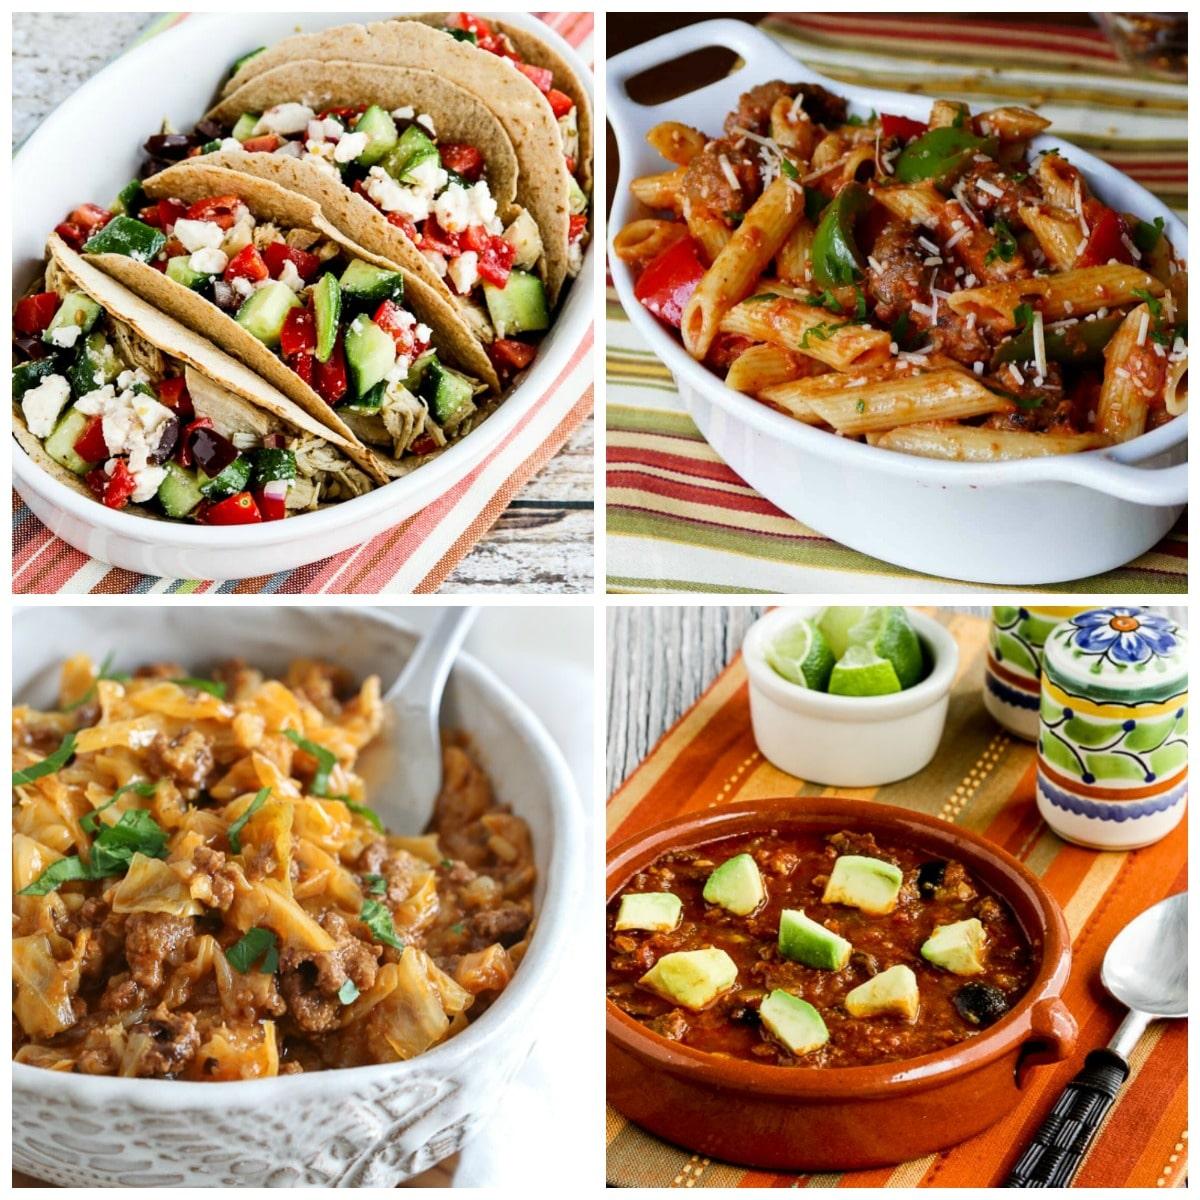 50 Amazing Instant Pot One-Pot Meals top collage photo